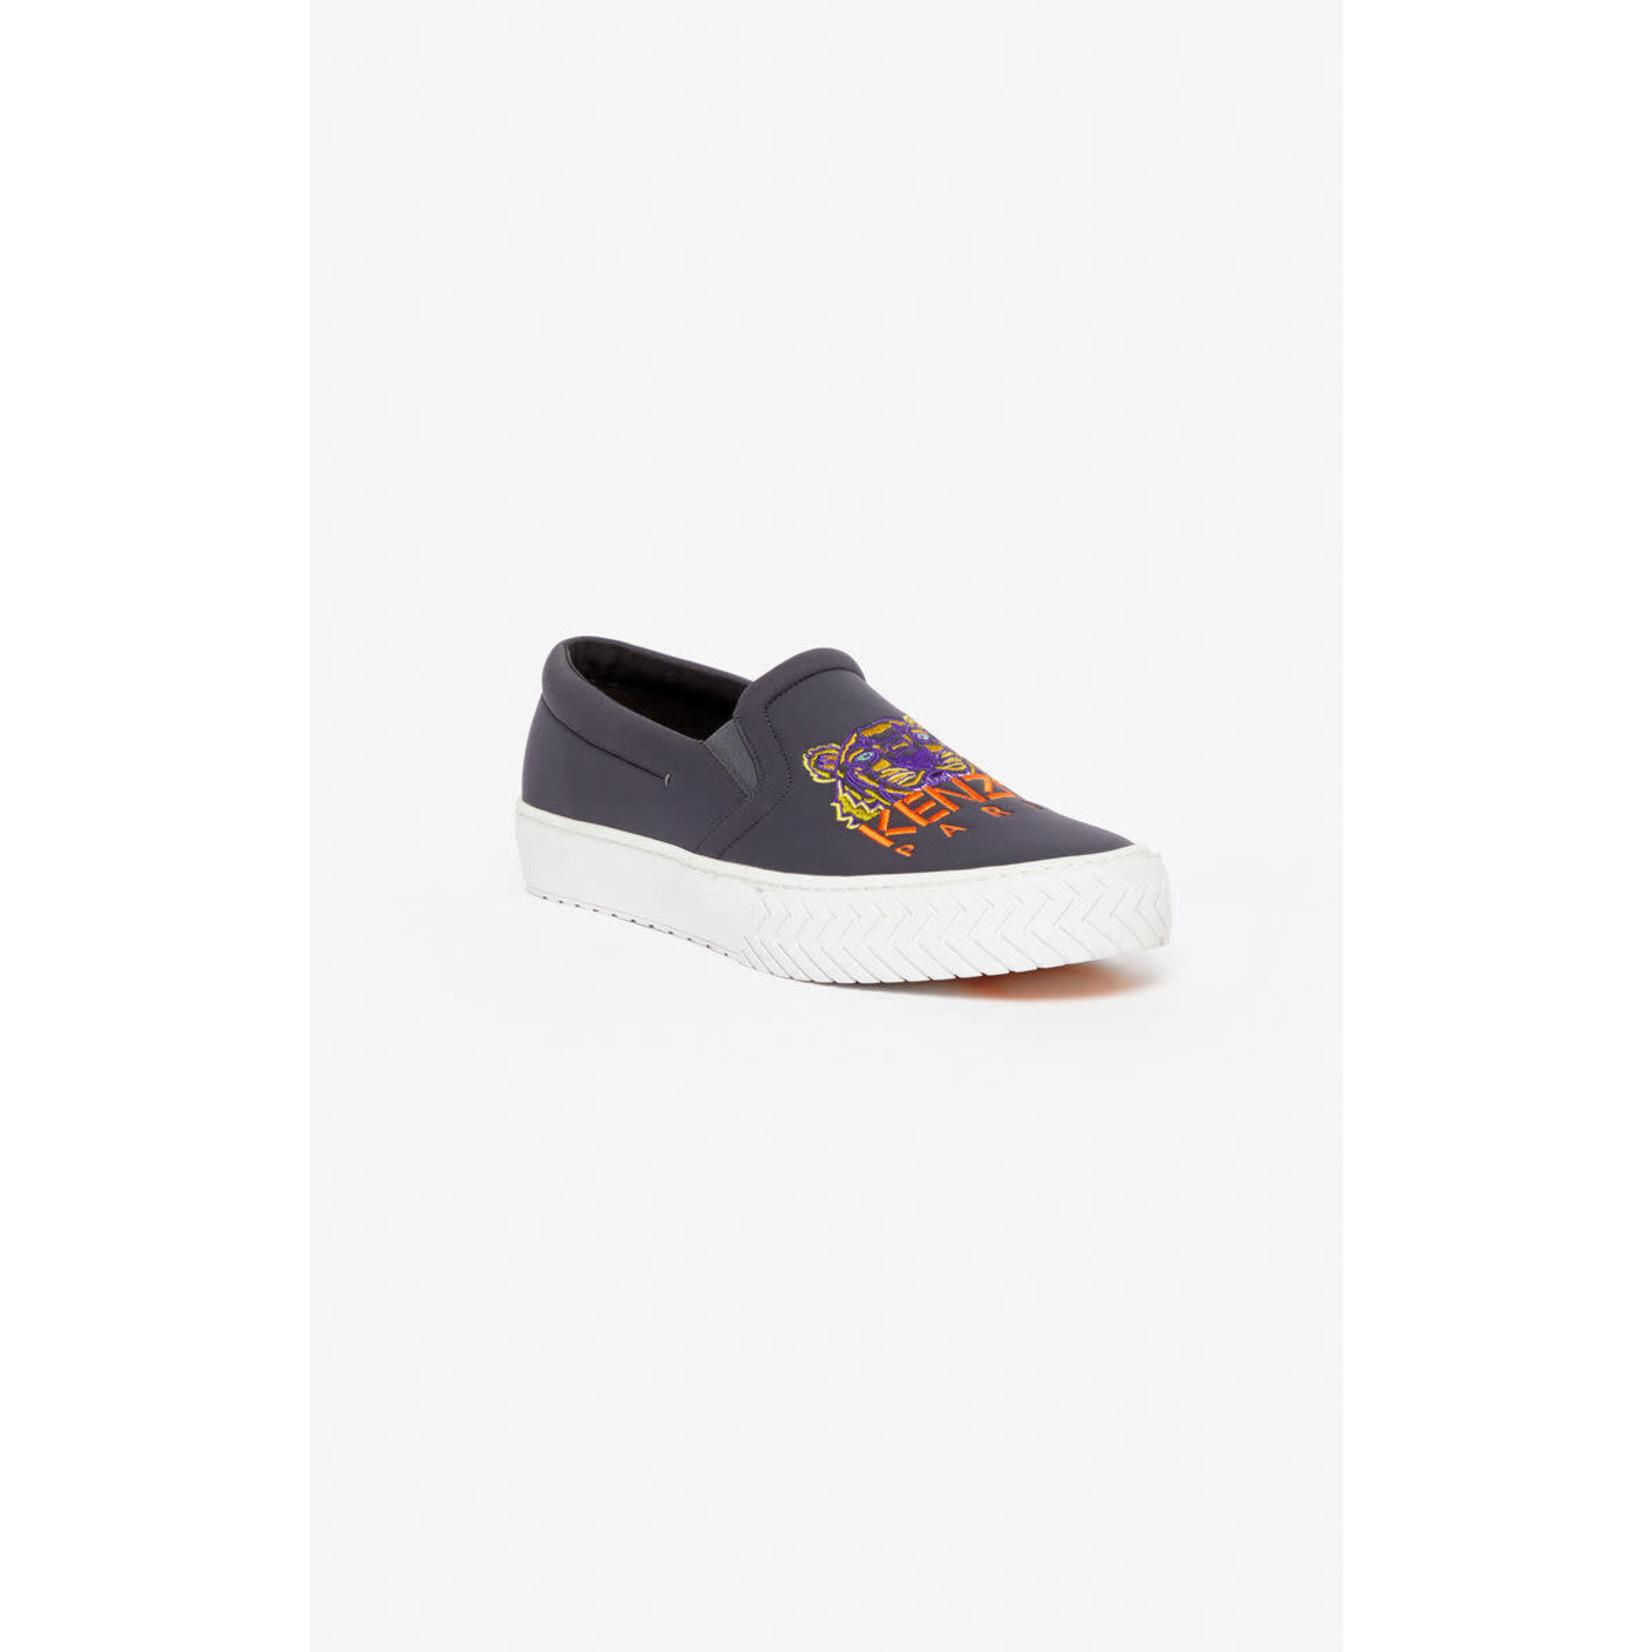 KENZO Kenzo - Unisex K-Skate Slip On Sneakers